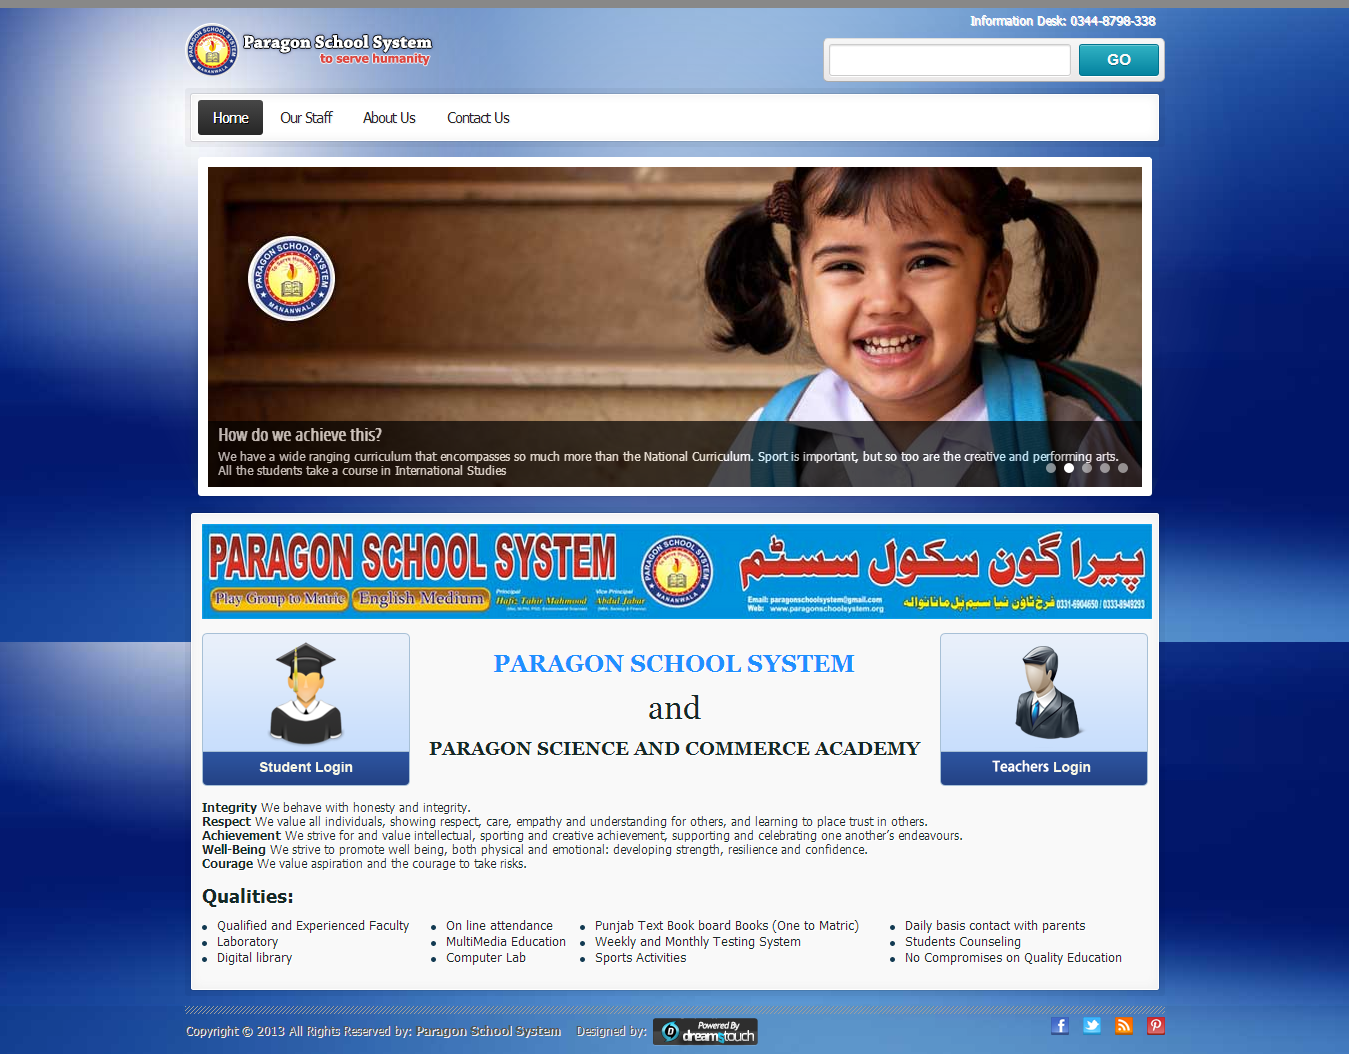 paragonschoolsystem.org